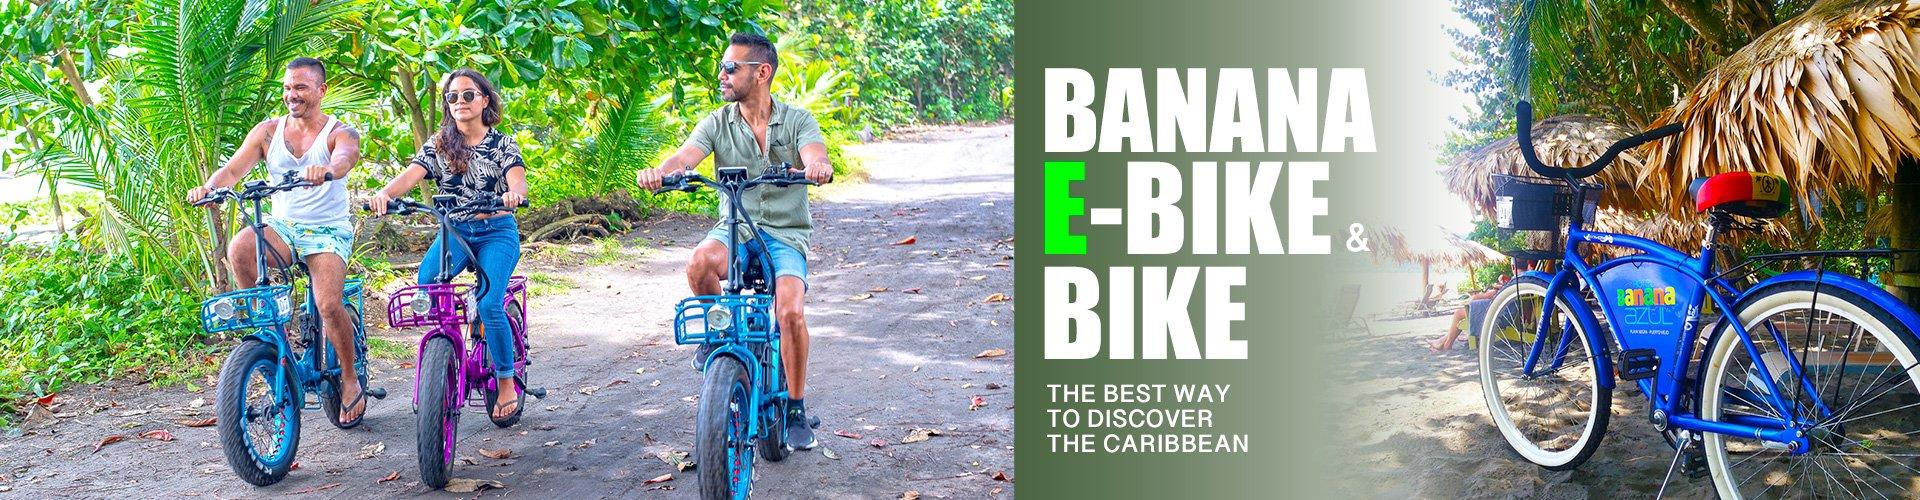 Banana Bikes